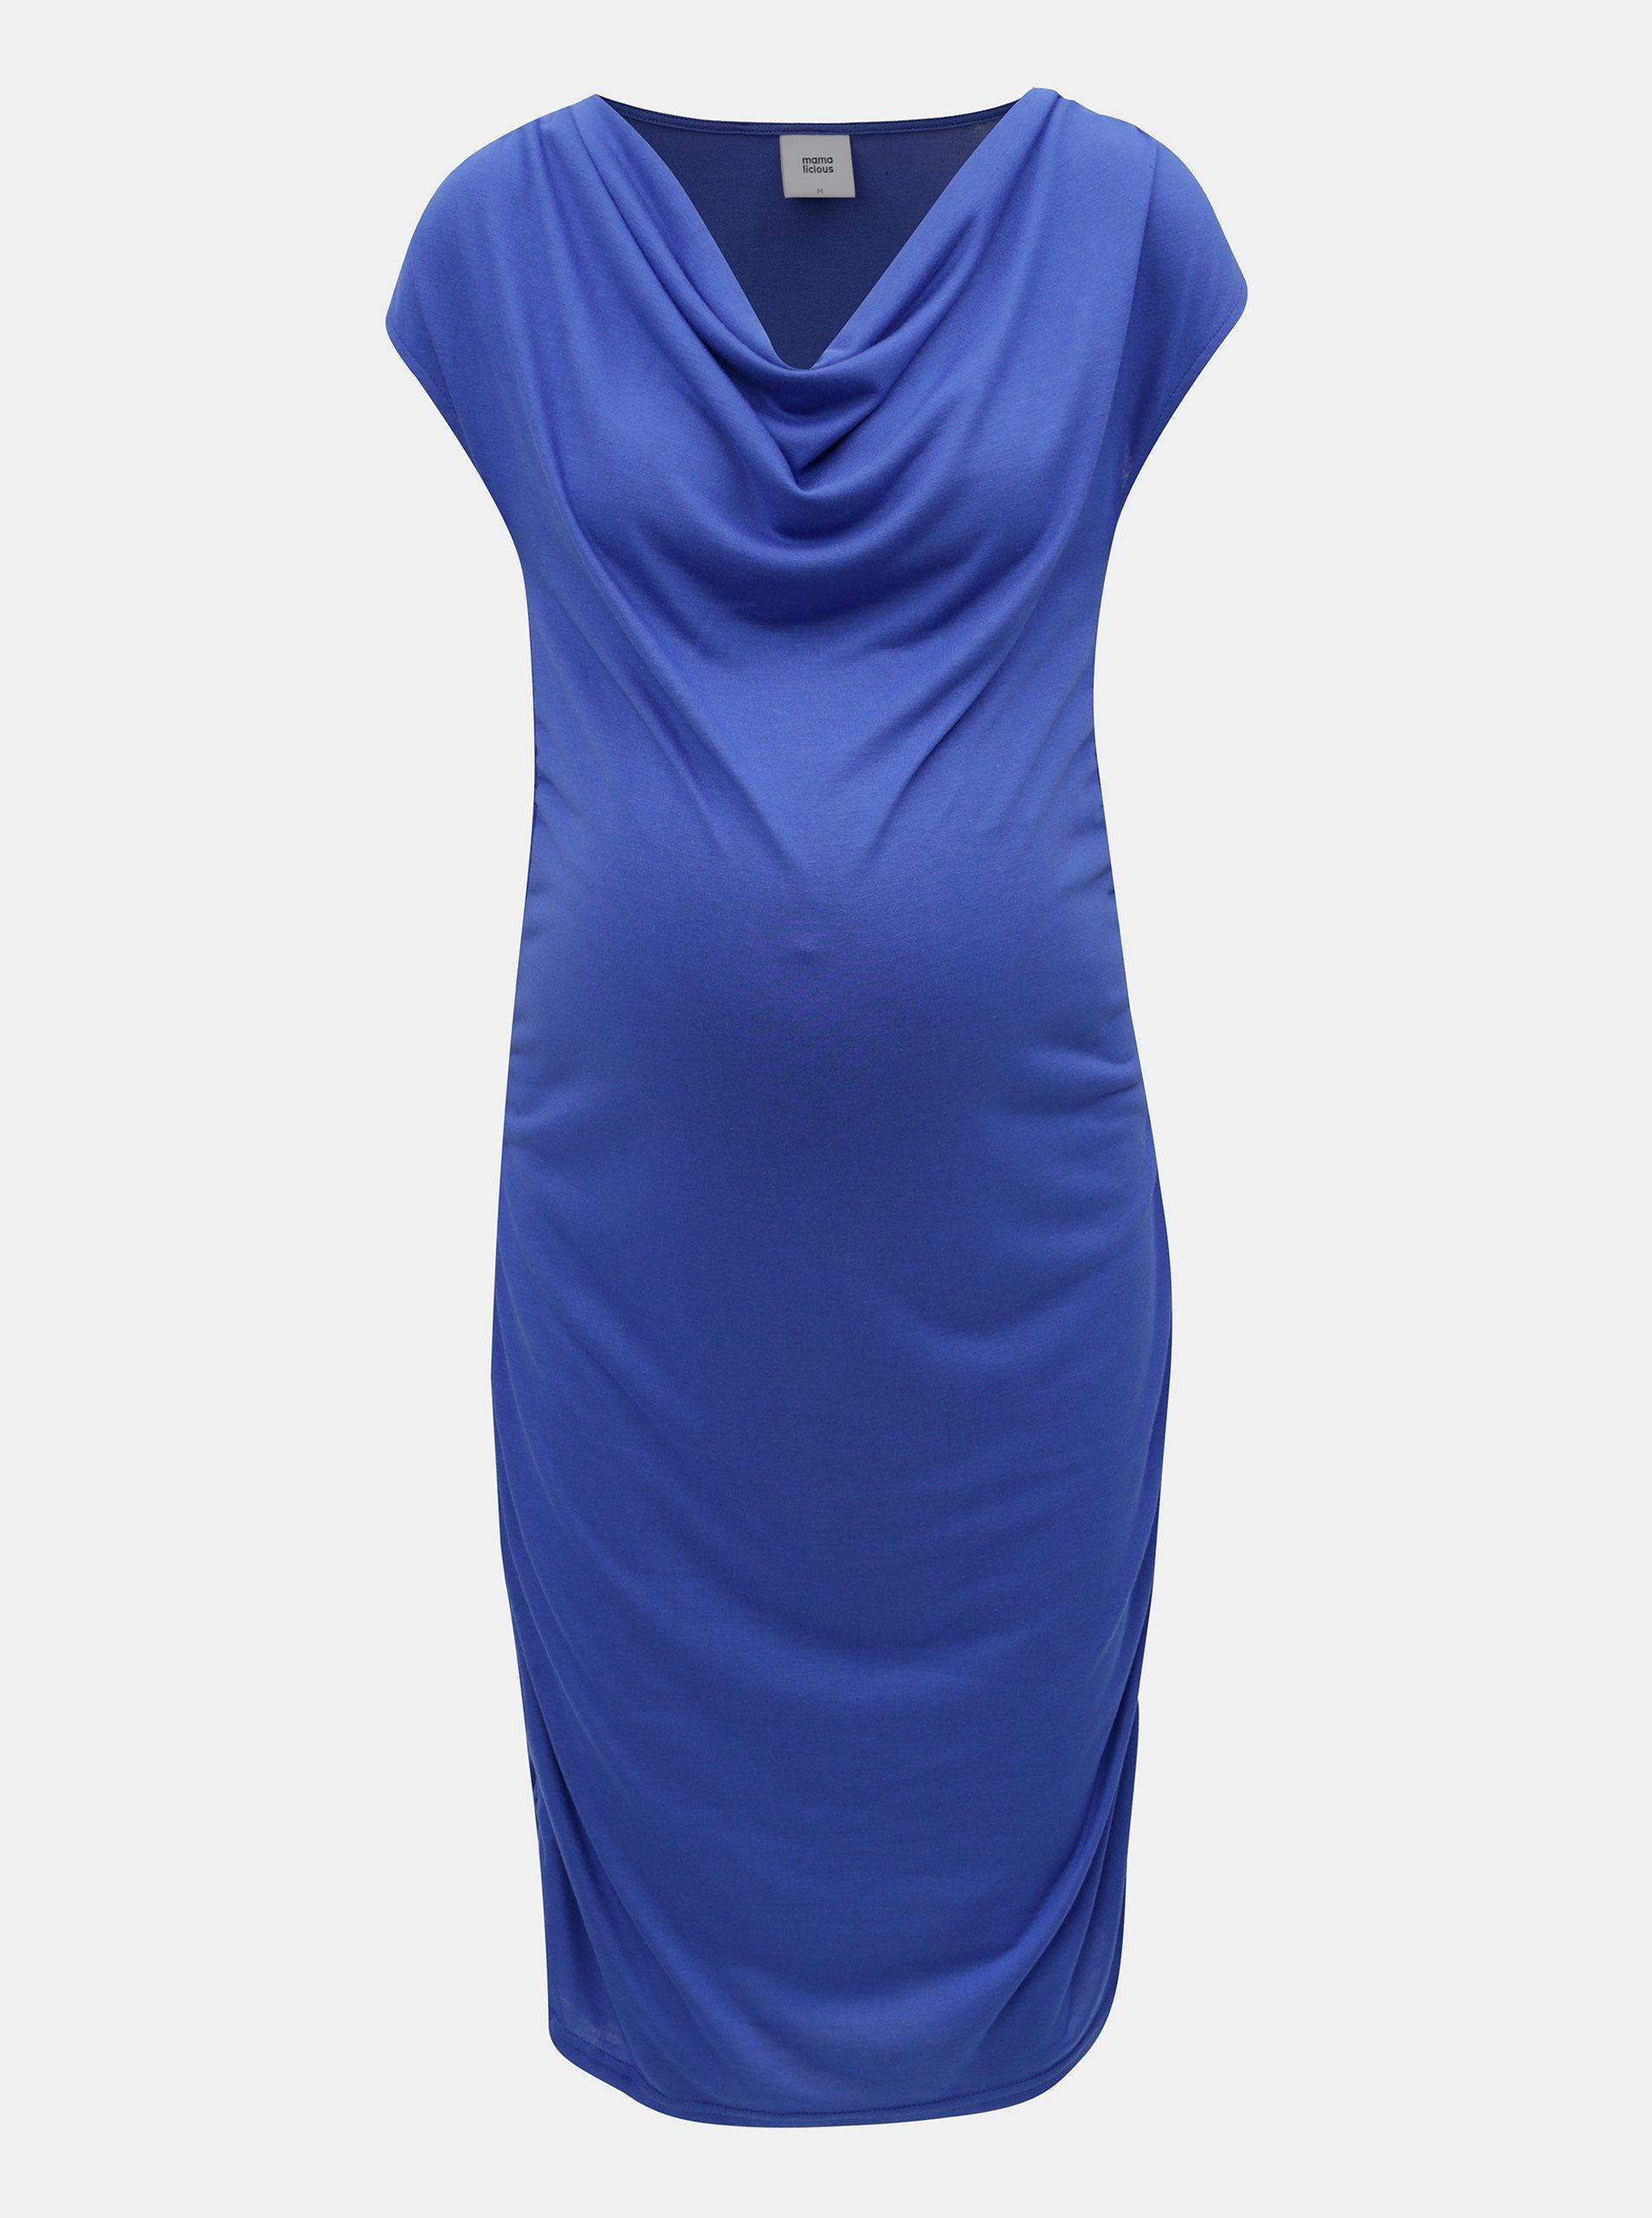 Modré tehotenské puzdrové šaty Mama.licious 57c4bdd802e